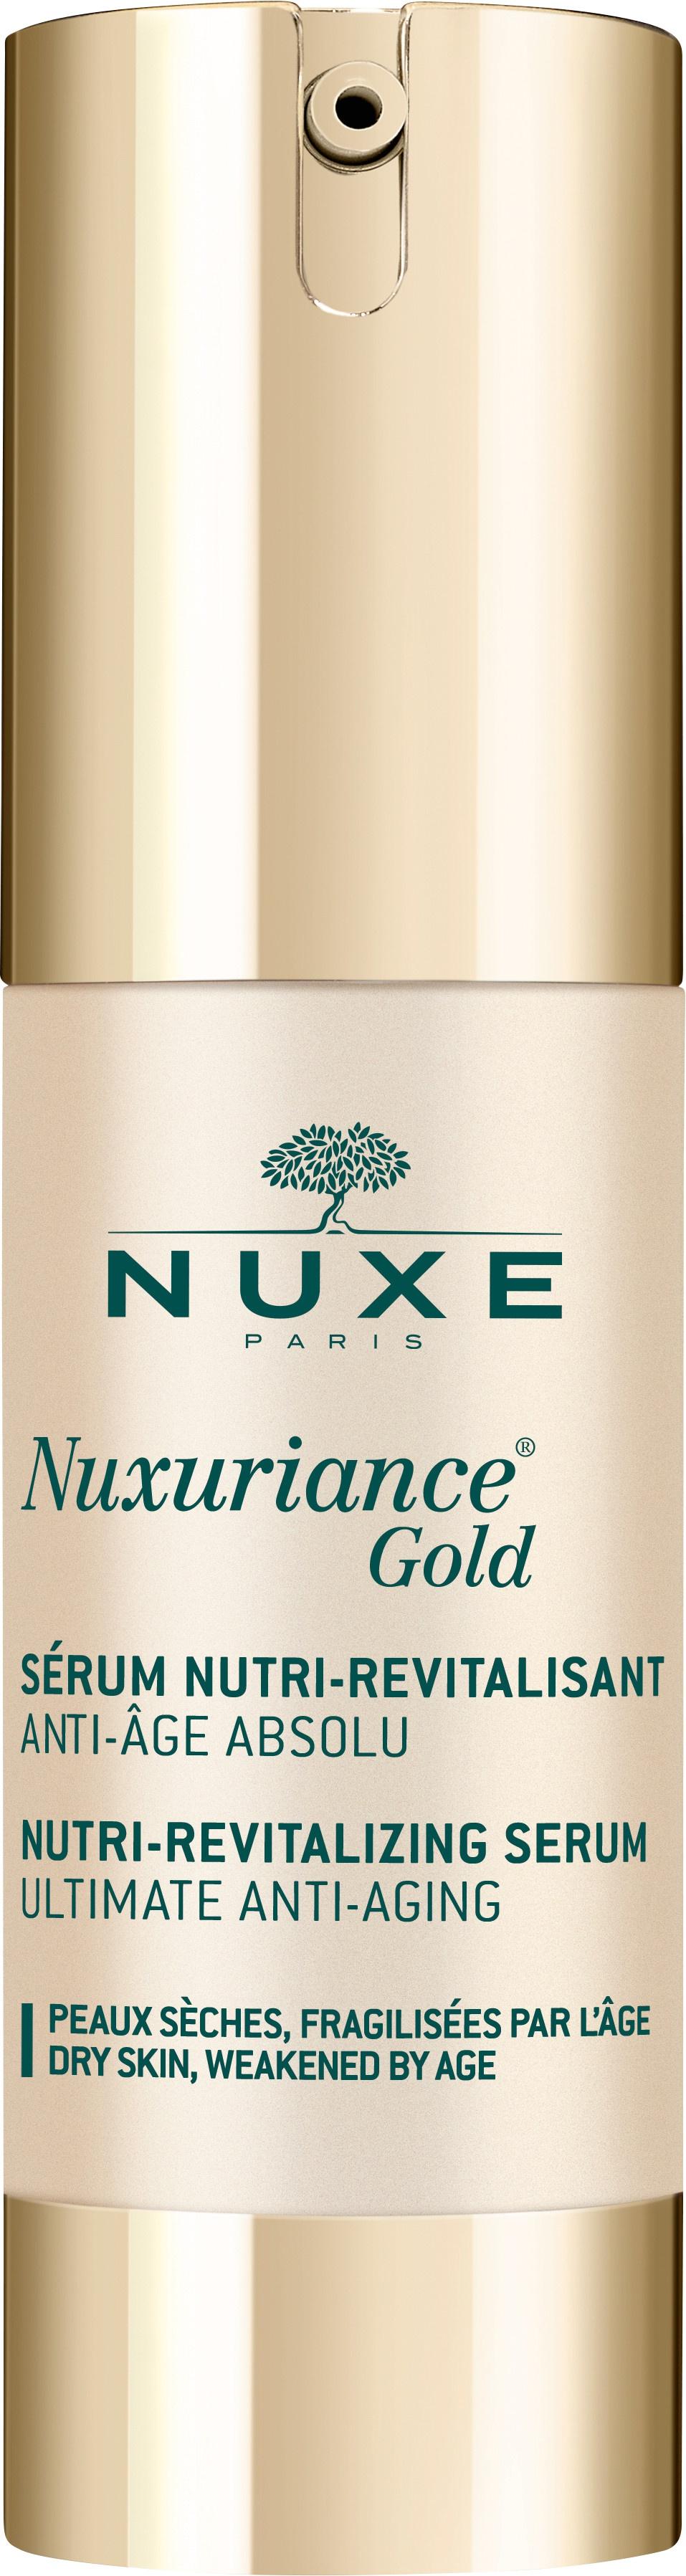 Nuxe Nuxuriance® Gold Nutri-Revitalising Serum